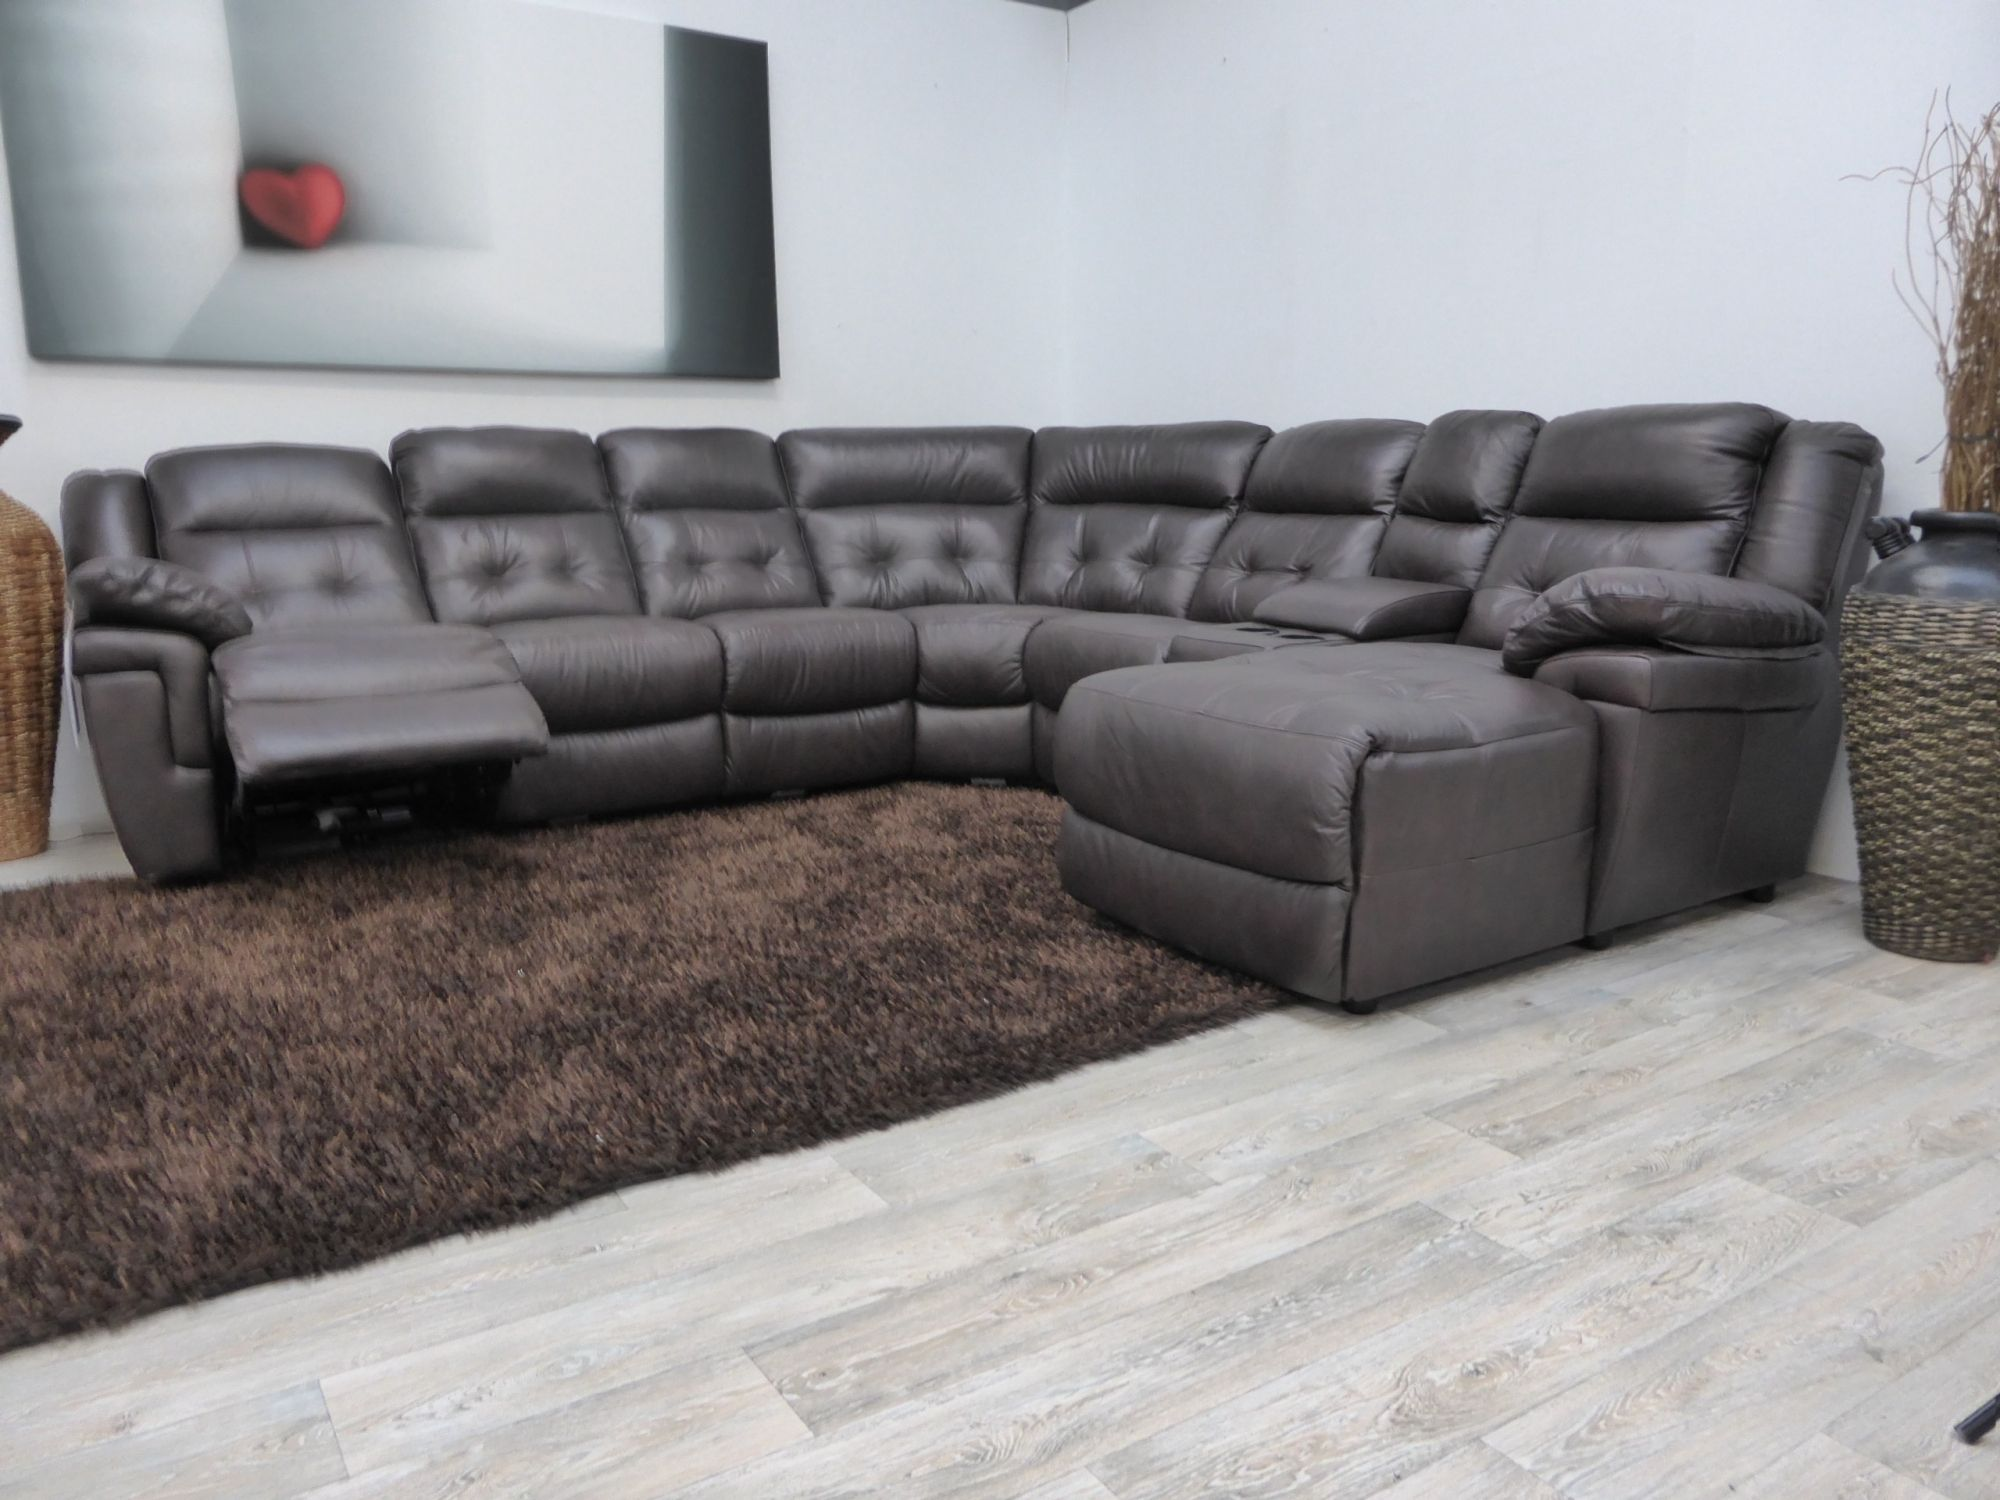 Sofa Lazy Boy Sectional Sofas Carpet Wooden Floor Decorative